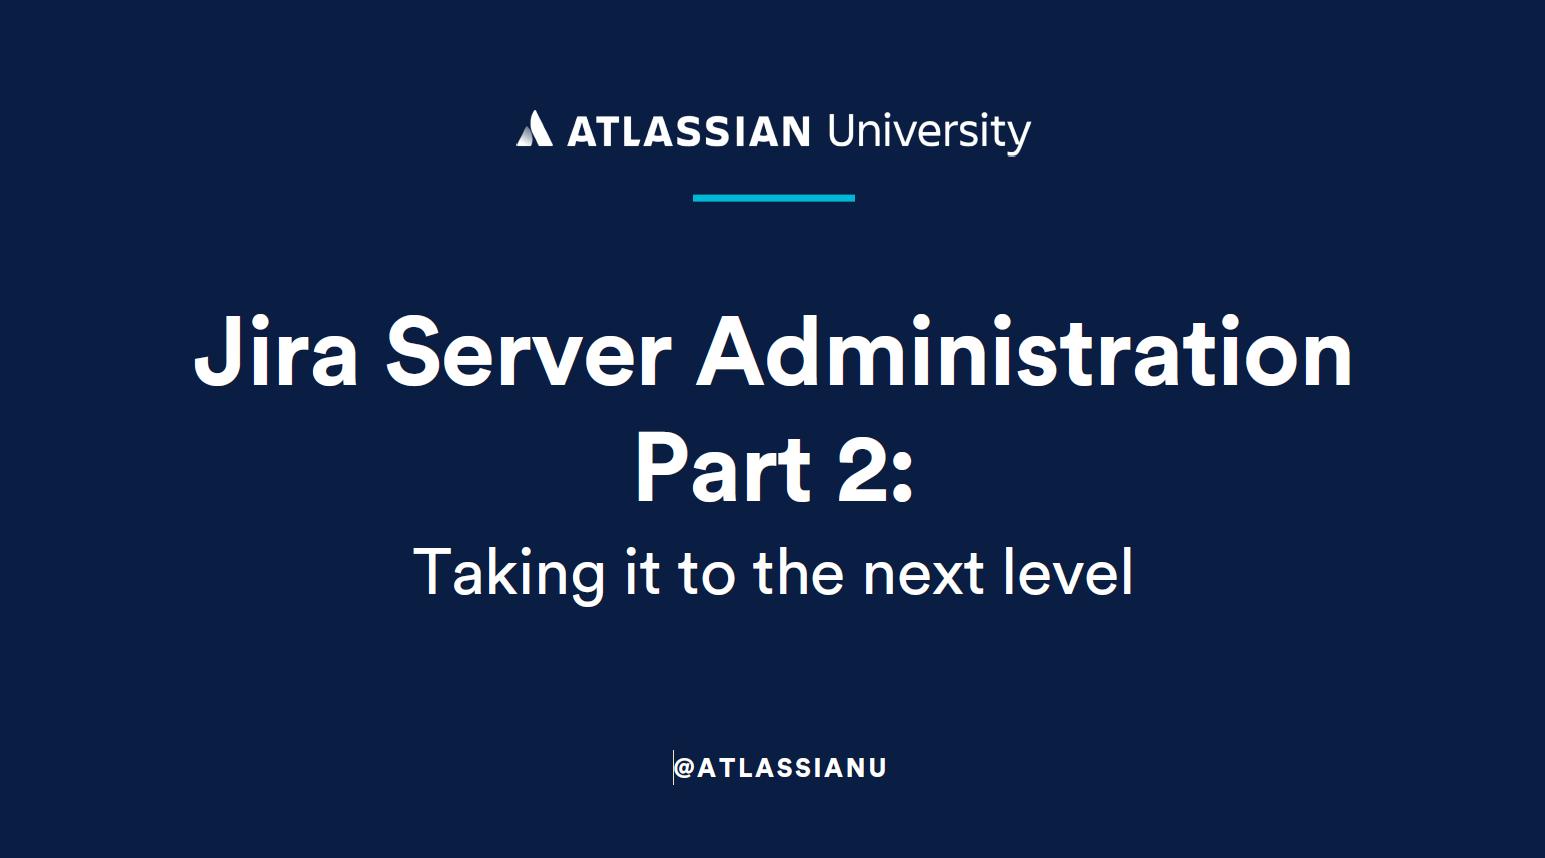 Jira Server Administration Part 2 (1)